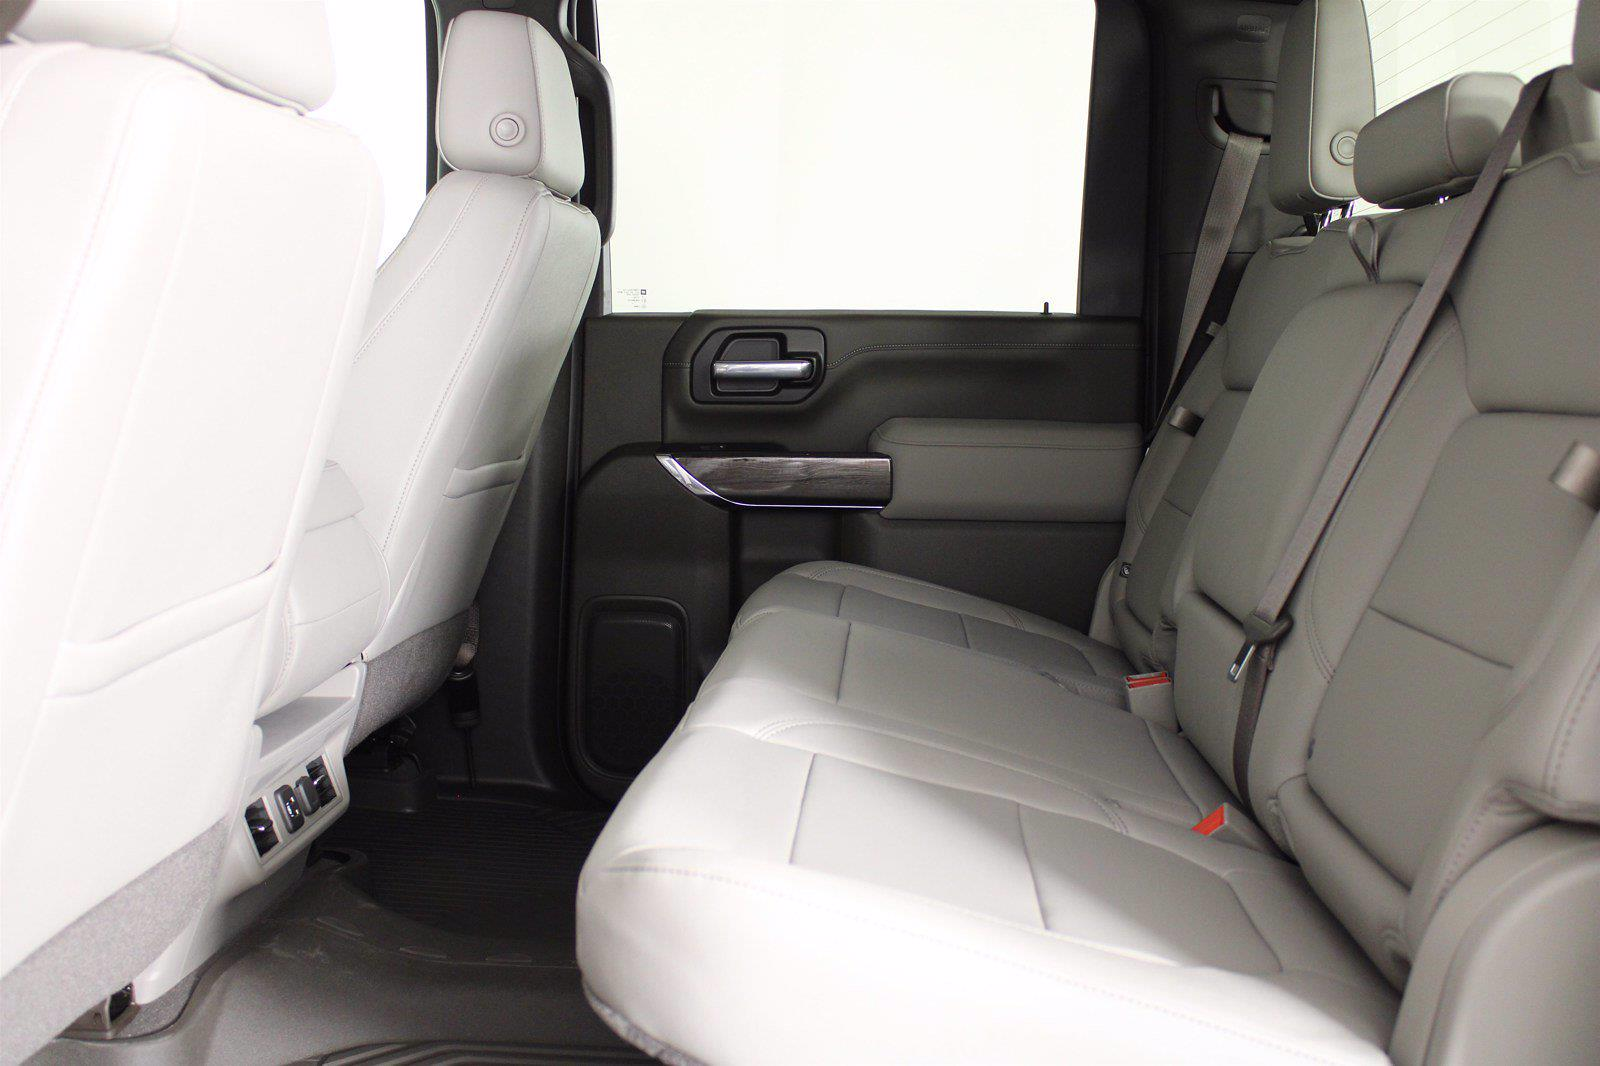 2021 Chevrolet Silverado 3500 Crew Cab 4x4, Pickup #D111089 - photo 16